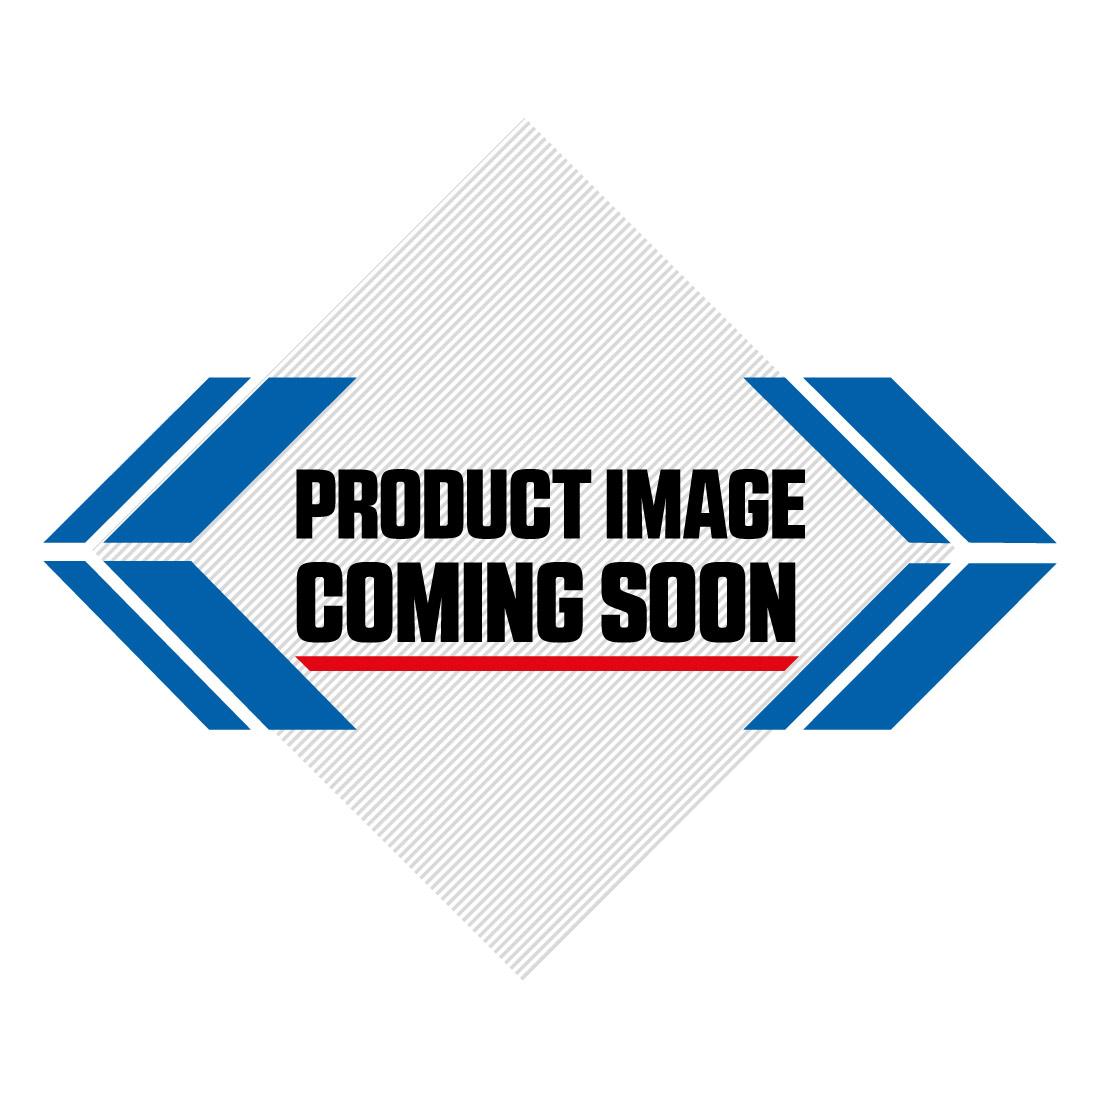 UFO KTM Plastic Kit SX 125 150 250 SXF 250 350 450 (16-18) White Image-4>